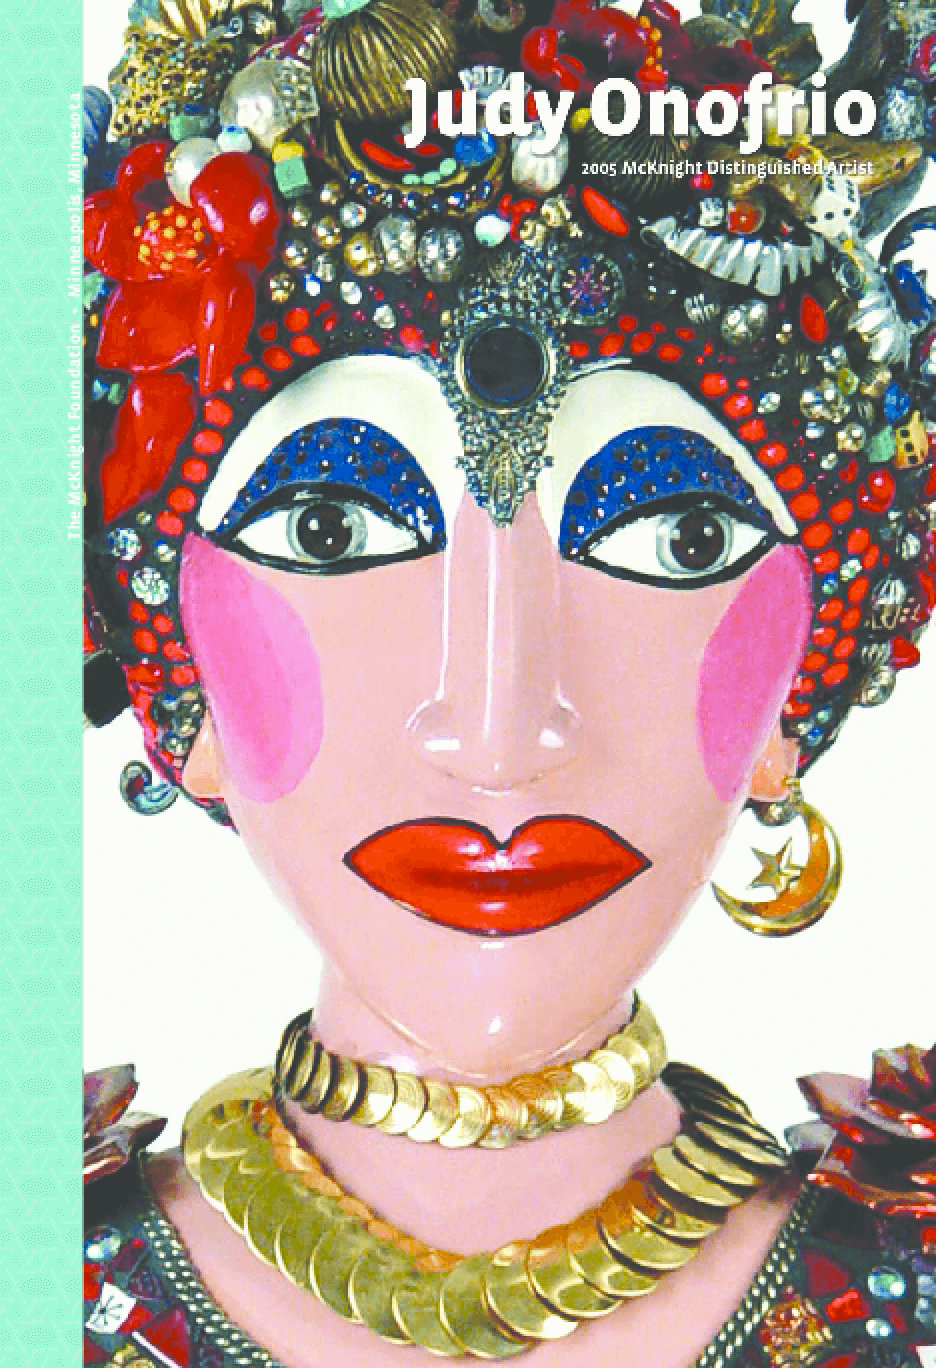 Judy Onofrio: 2005 McKnight Distinguished Artist